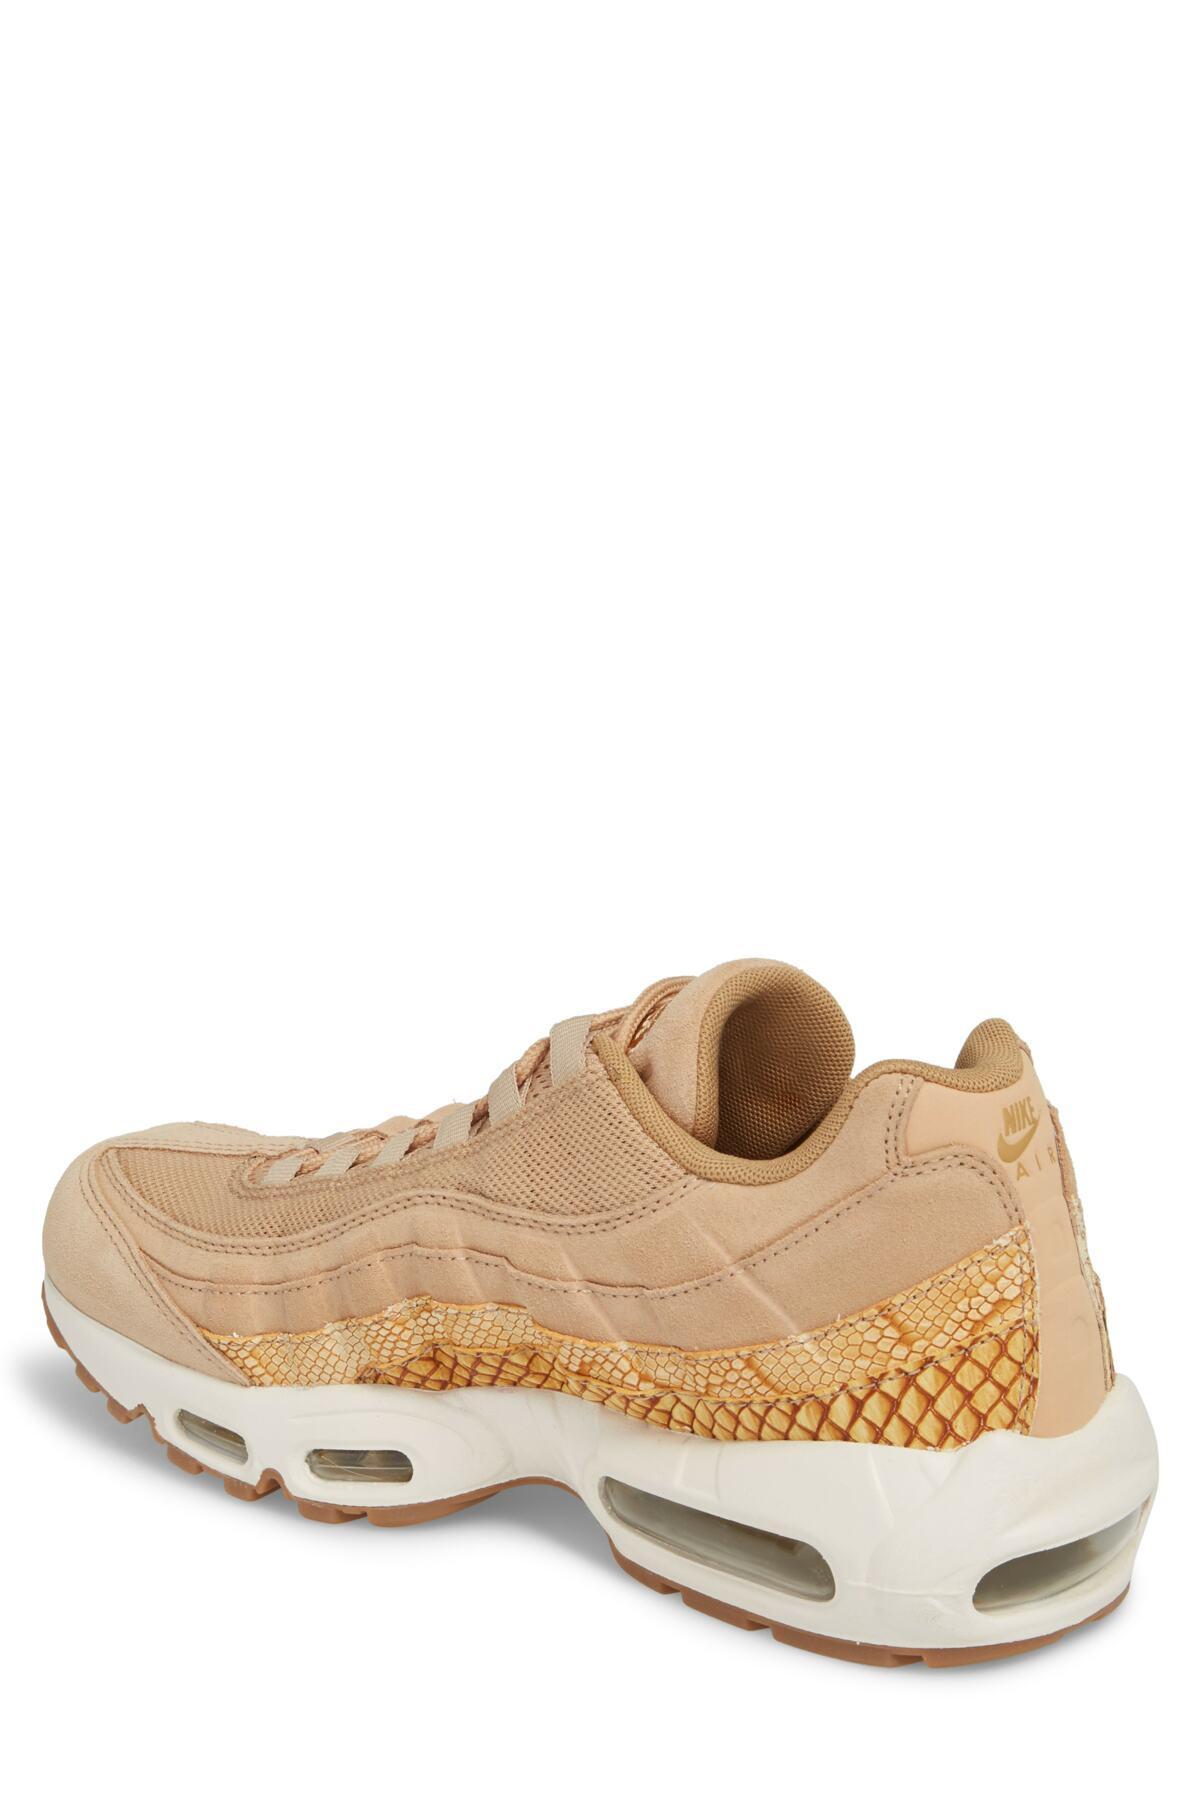 free shipping 72db5 78e96 Nike - Brown Air Max 95 Premium Se Sneaker (men) for Men - Lyst. View  fullscreen